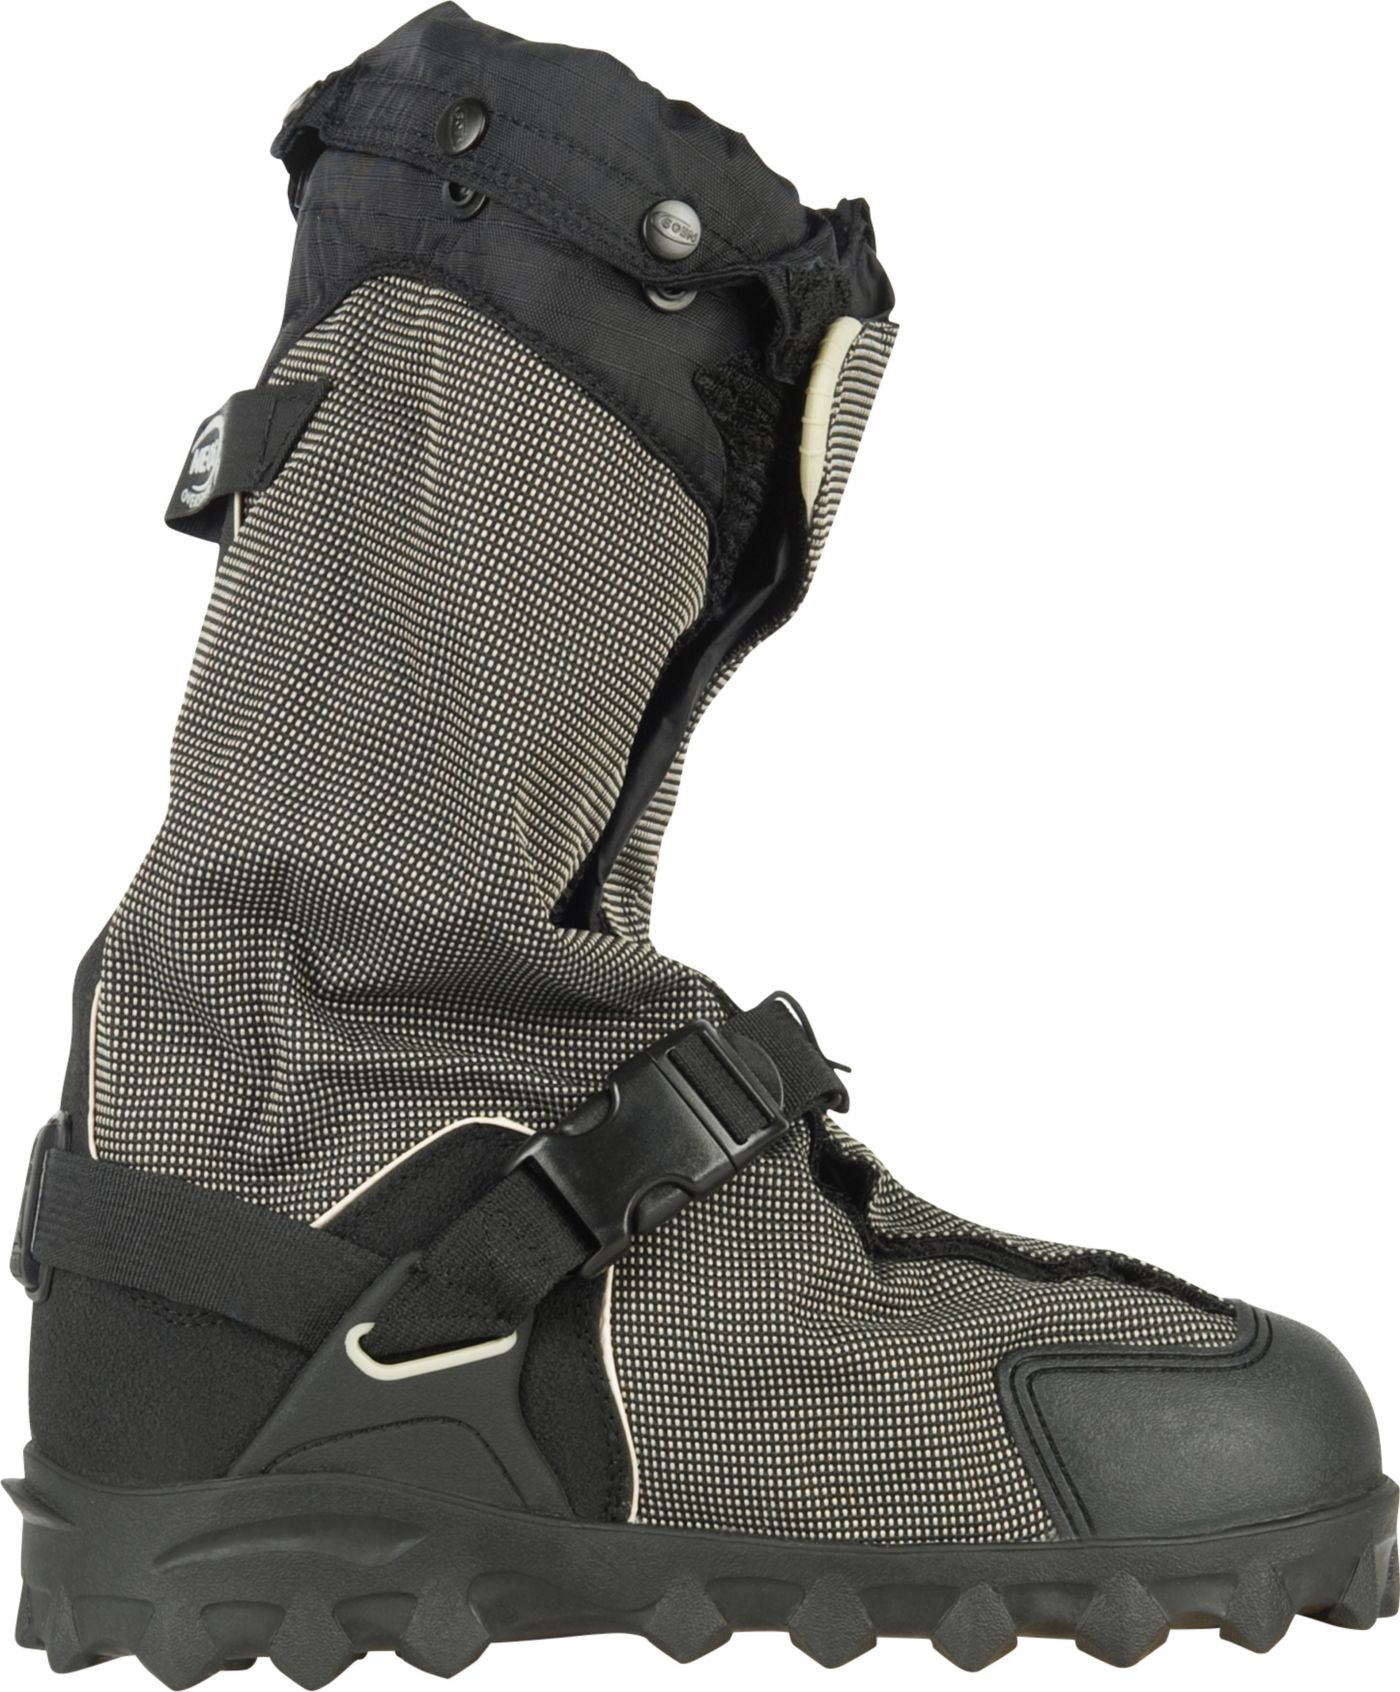 NEOS Adult Navigator 5 Insulated Waterproof Overshoes